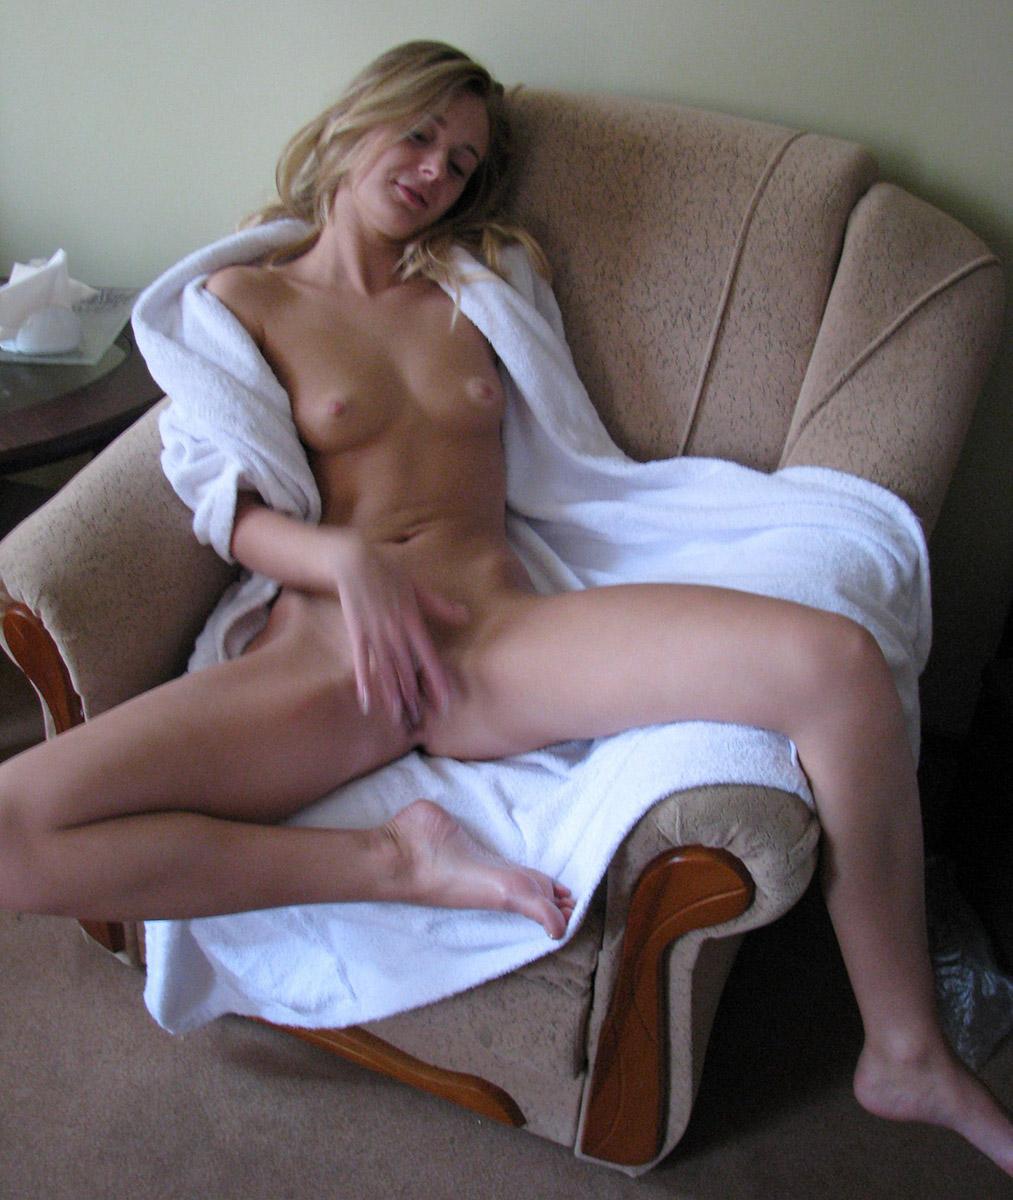 Hanna Hilton model fingering